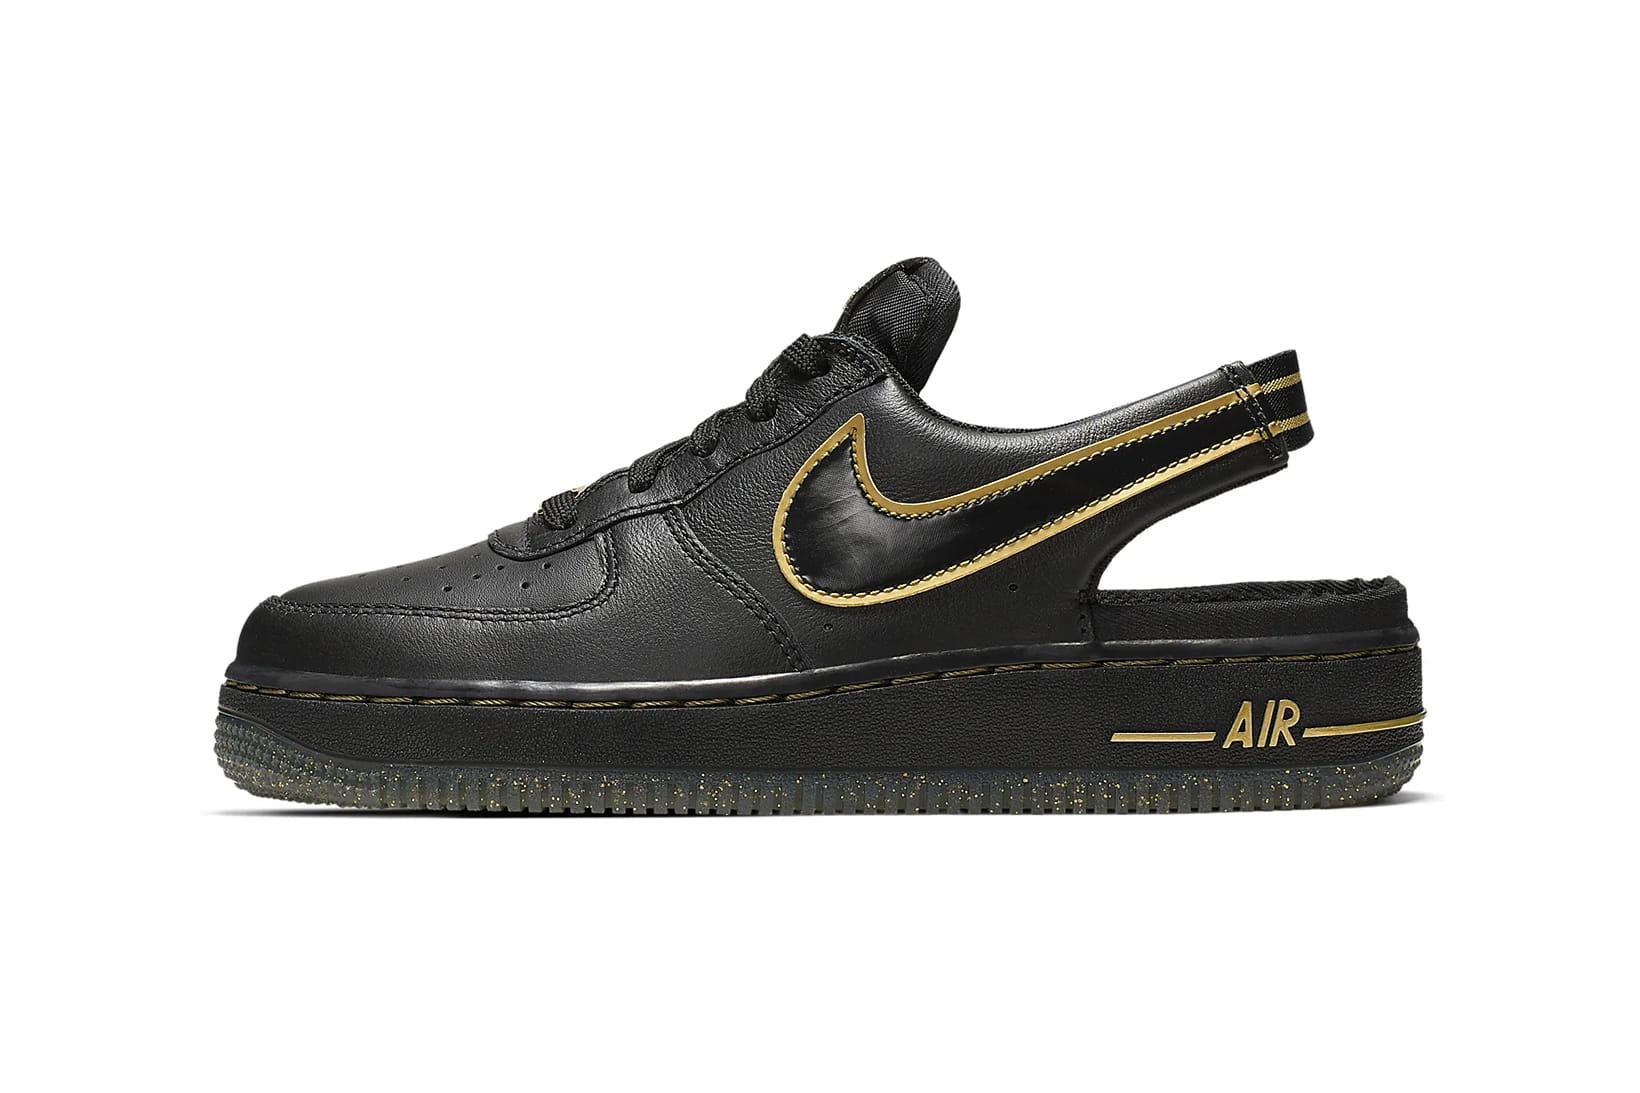 Nike's Air Force 1 VTF Big Kids' Shoe